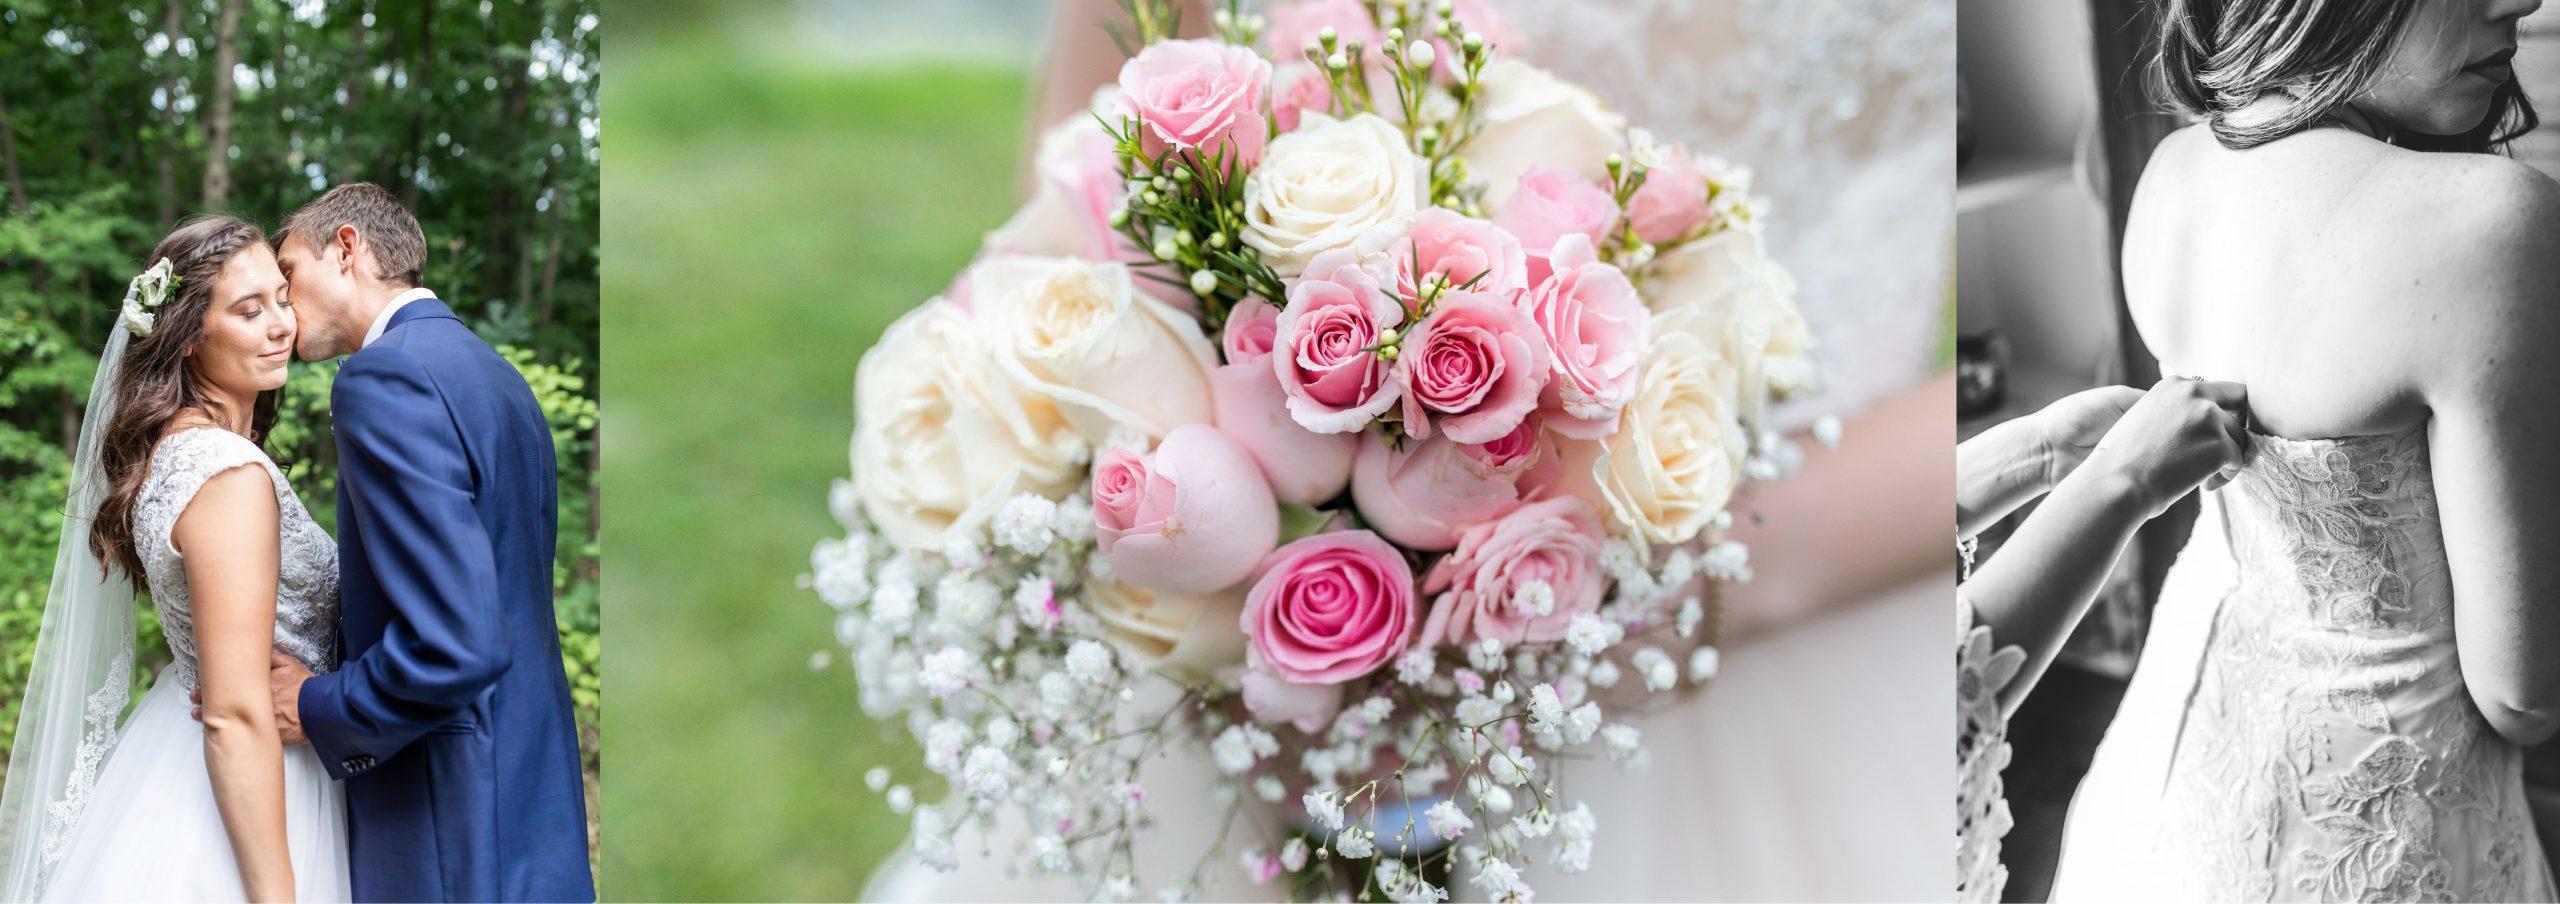 kandra-lynn-photography-michigan-wedding-photographer-14